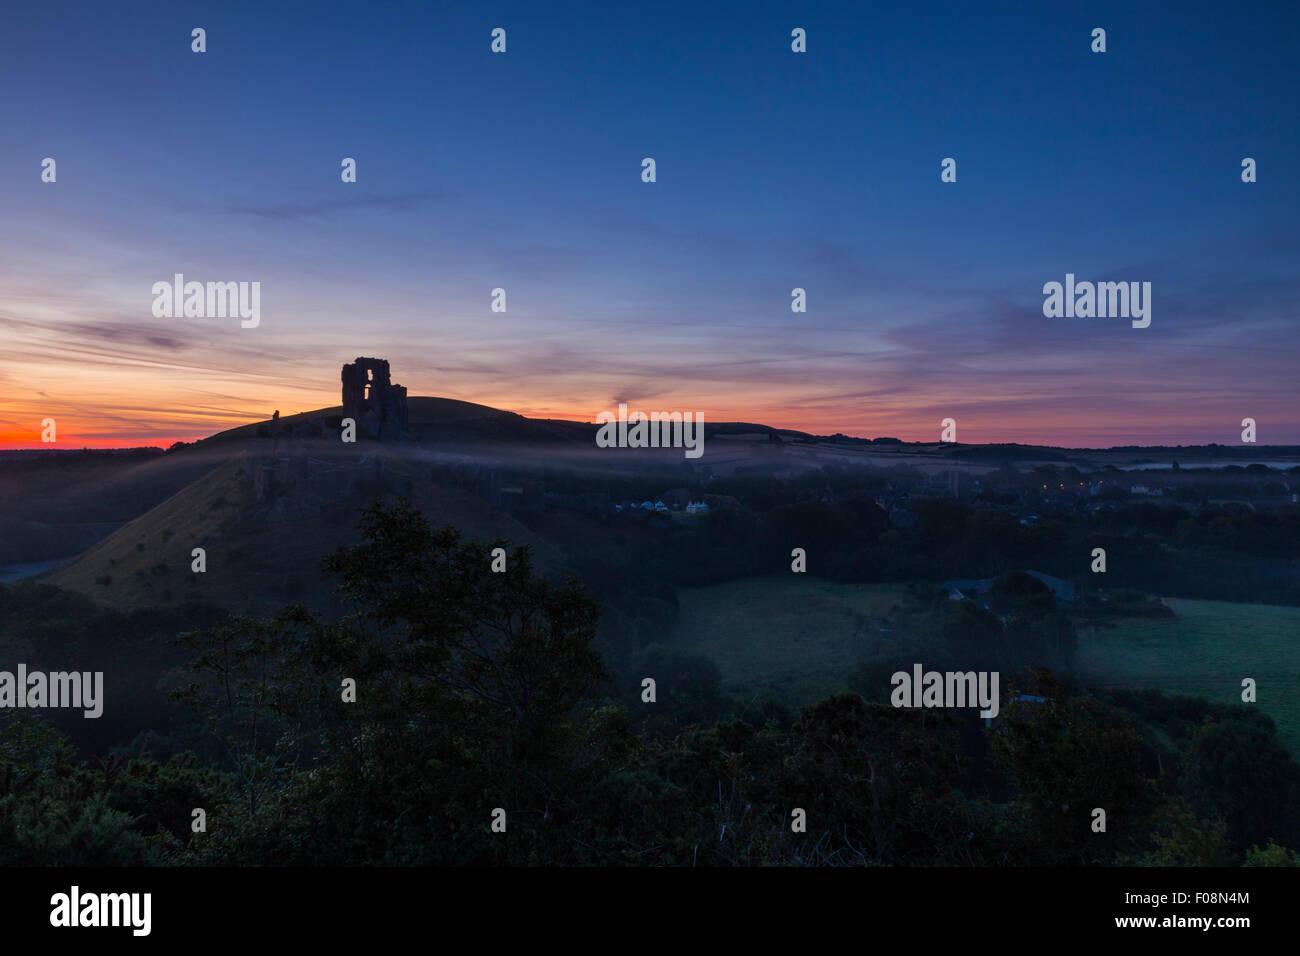 Sunrise over the ruins of Corfe Castle, Isle of Purbeck, Dorset, England, United Kingdom Stock Photo